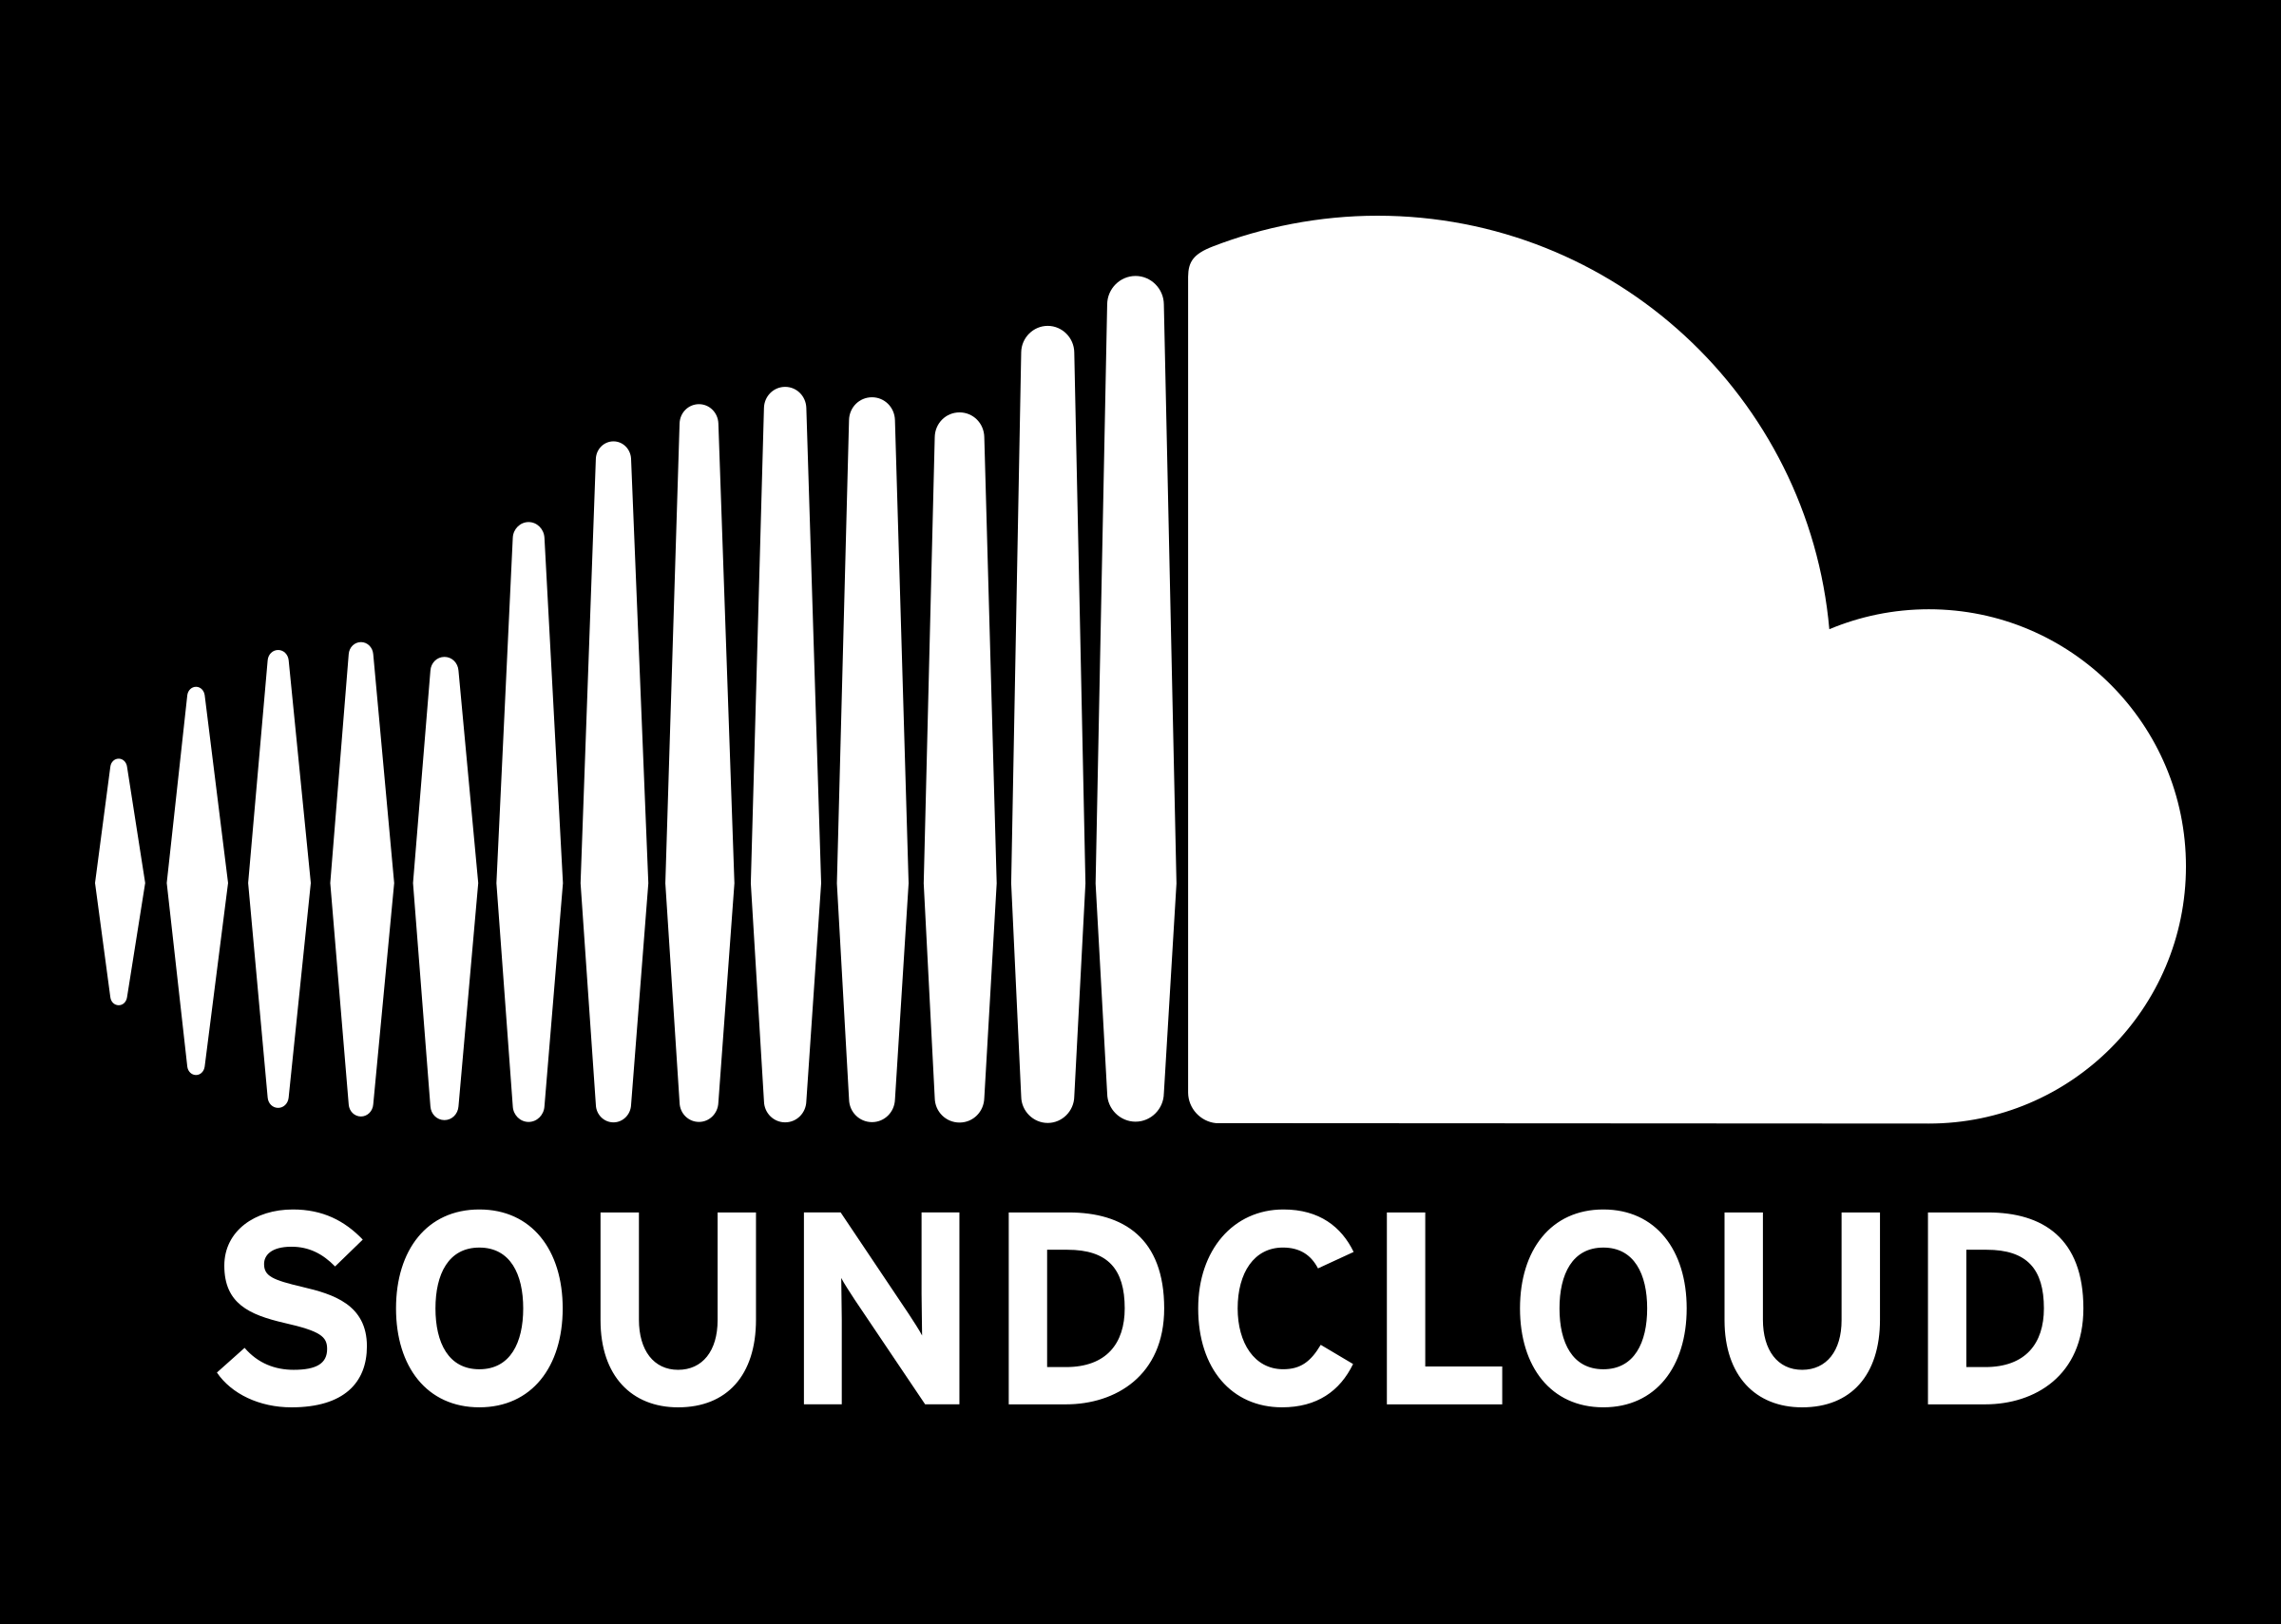 soundcloud-logo-white.png